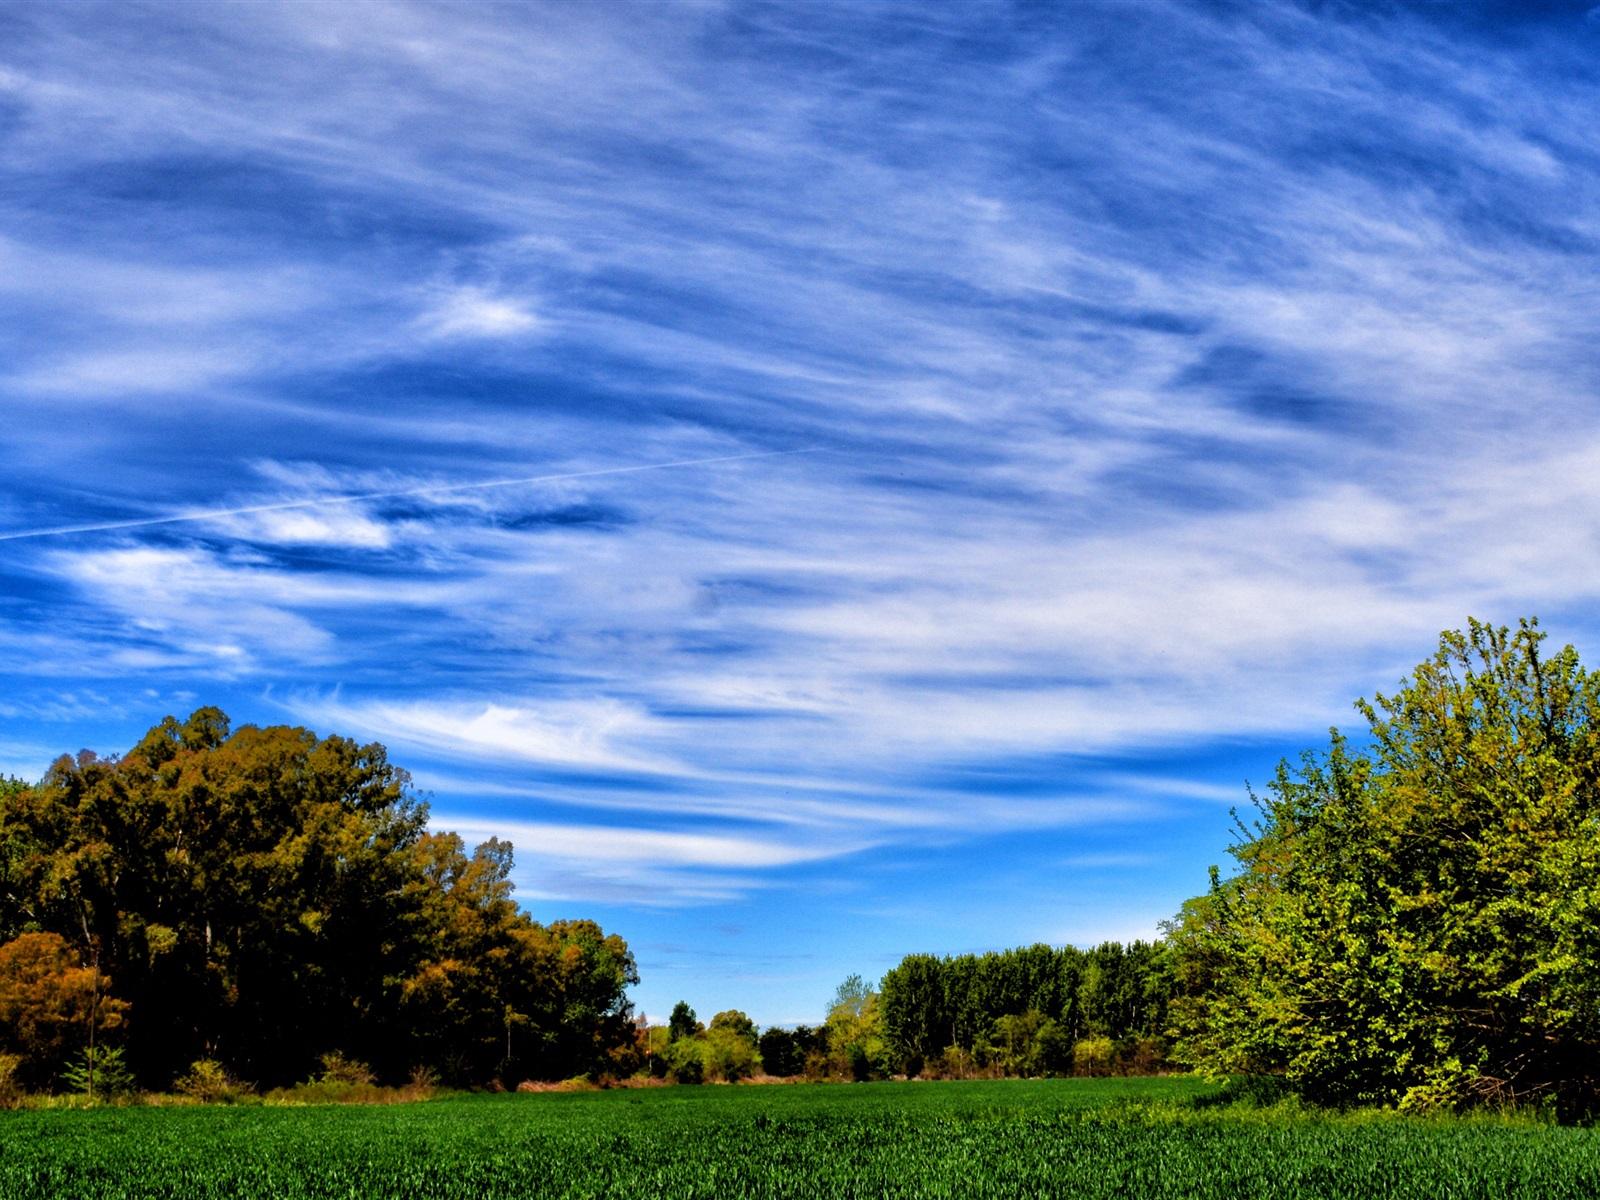 sky blue wallpapers download